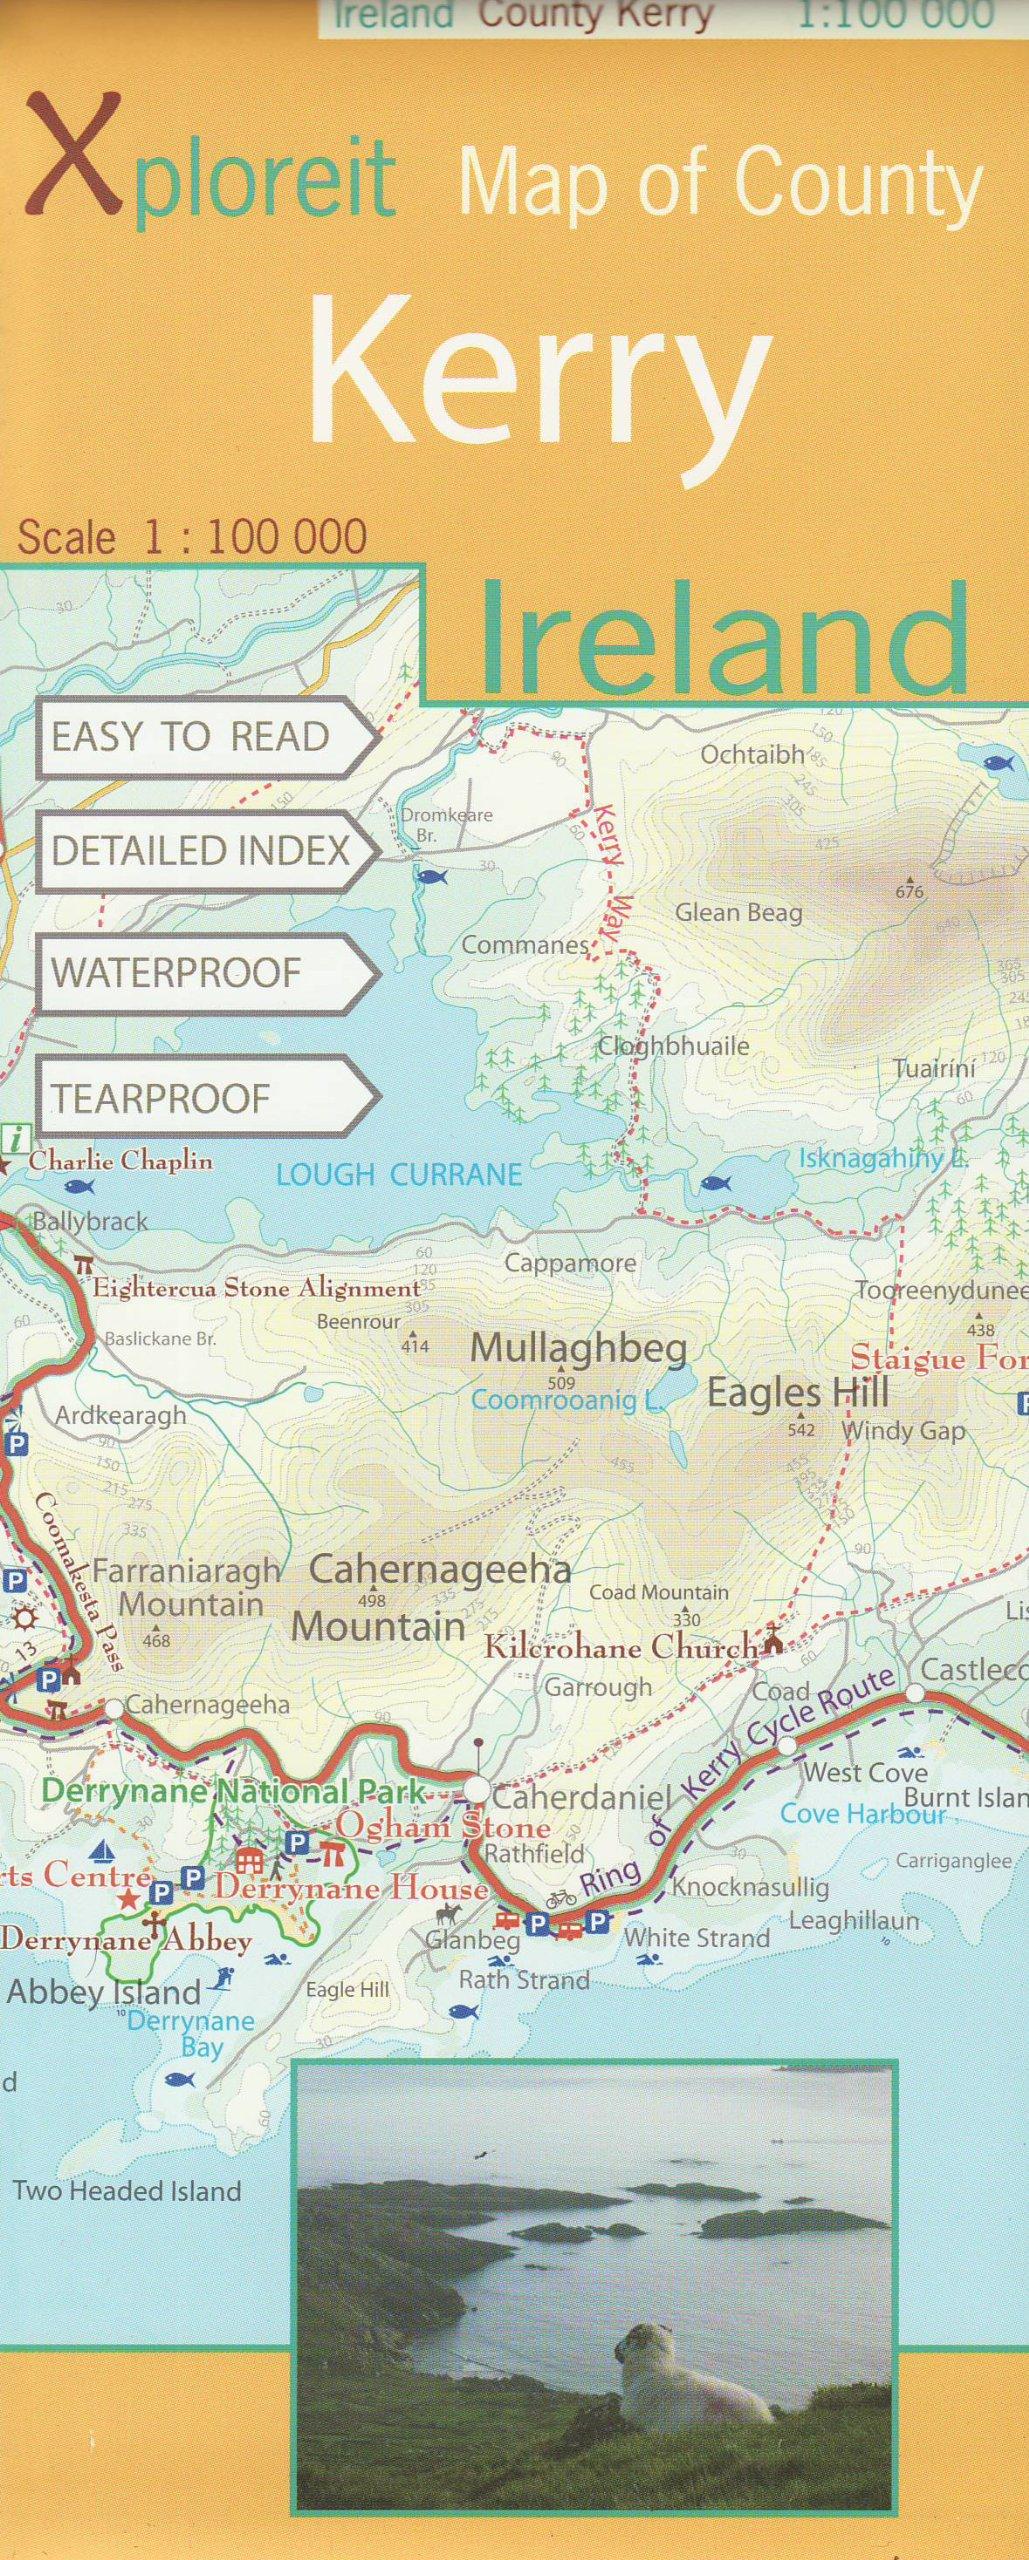 xploreit-map-of-county-kerry-ireland-1-100k-xploreit-county-series